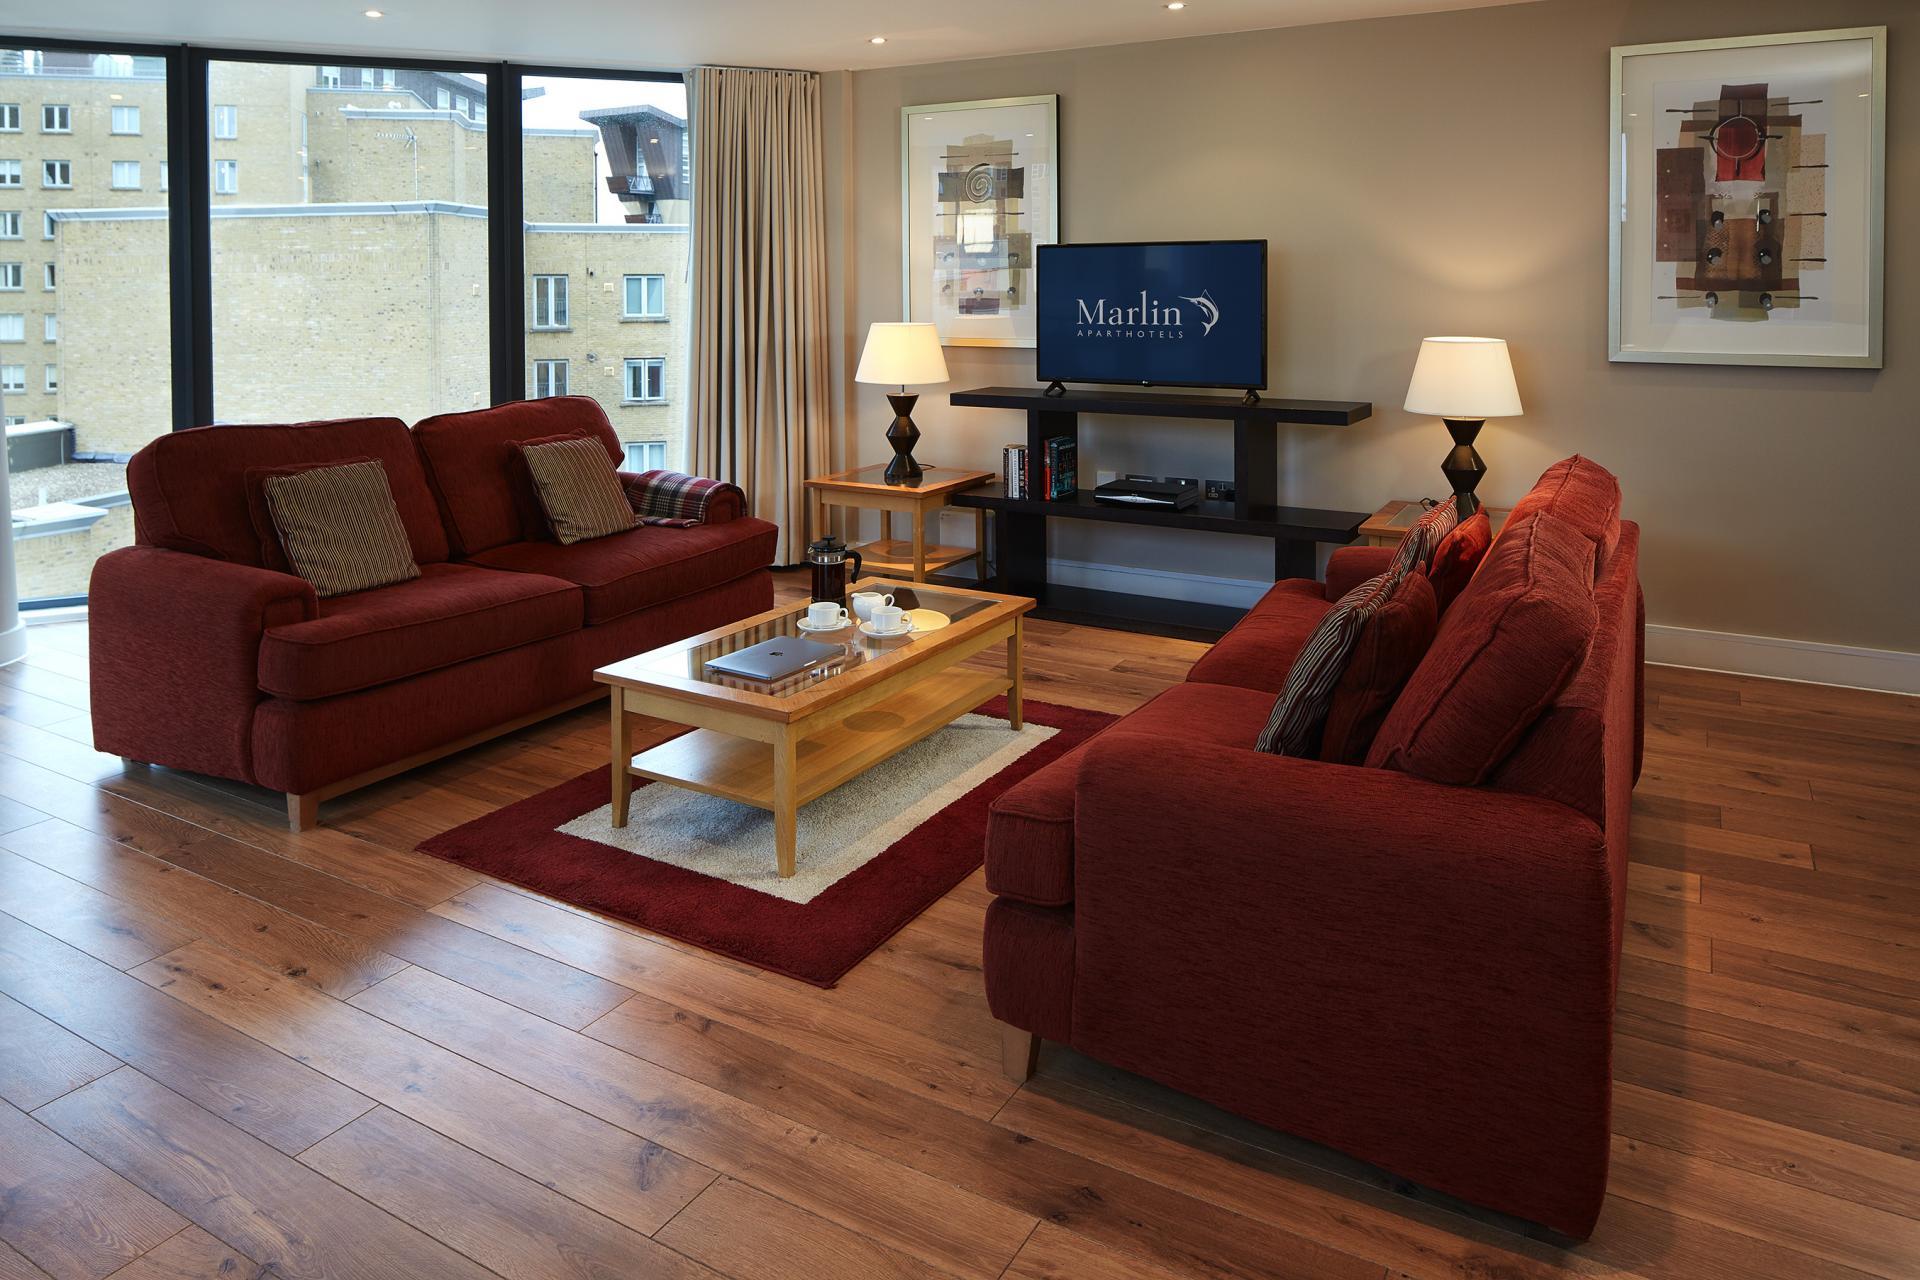 Living area at Marlin Canary Wharf Apartments, Canary Wharf, London